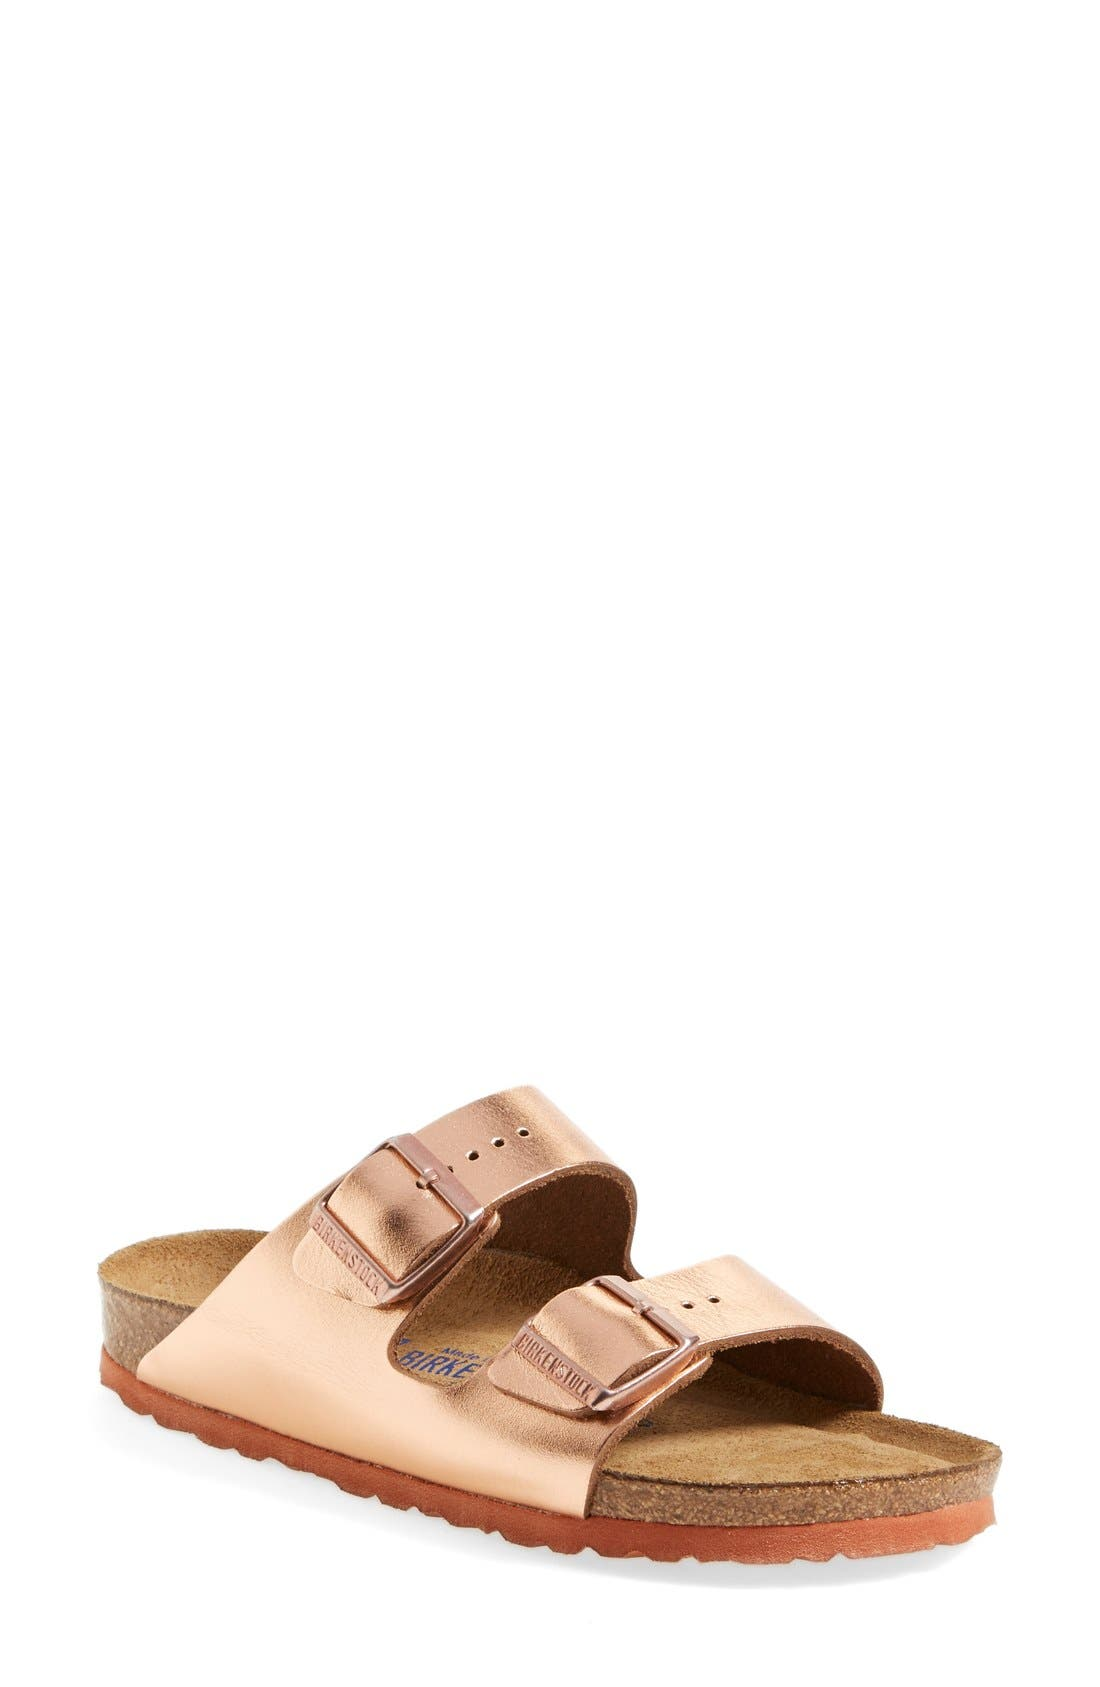 Alternate Image 1 Selected - Birkenstock 'Arizona' Soft Footbed Leather Sandal (Women)